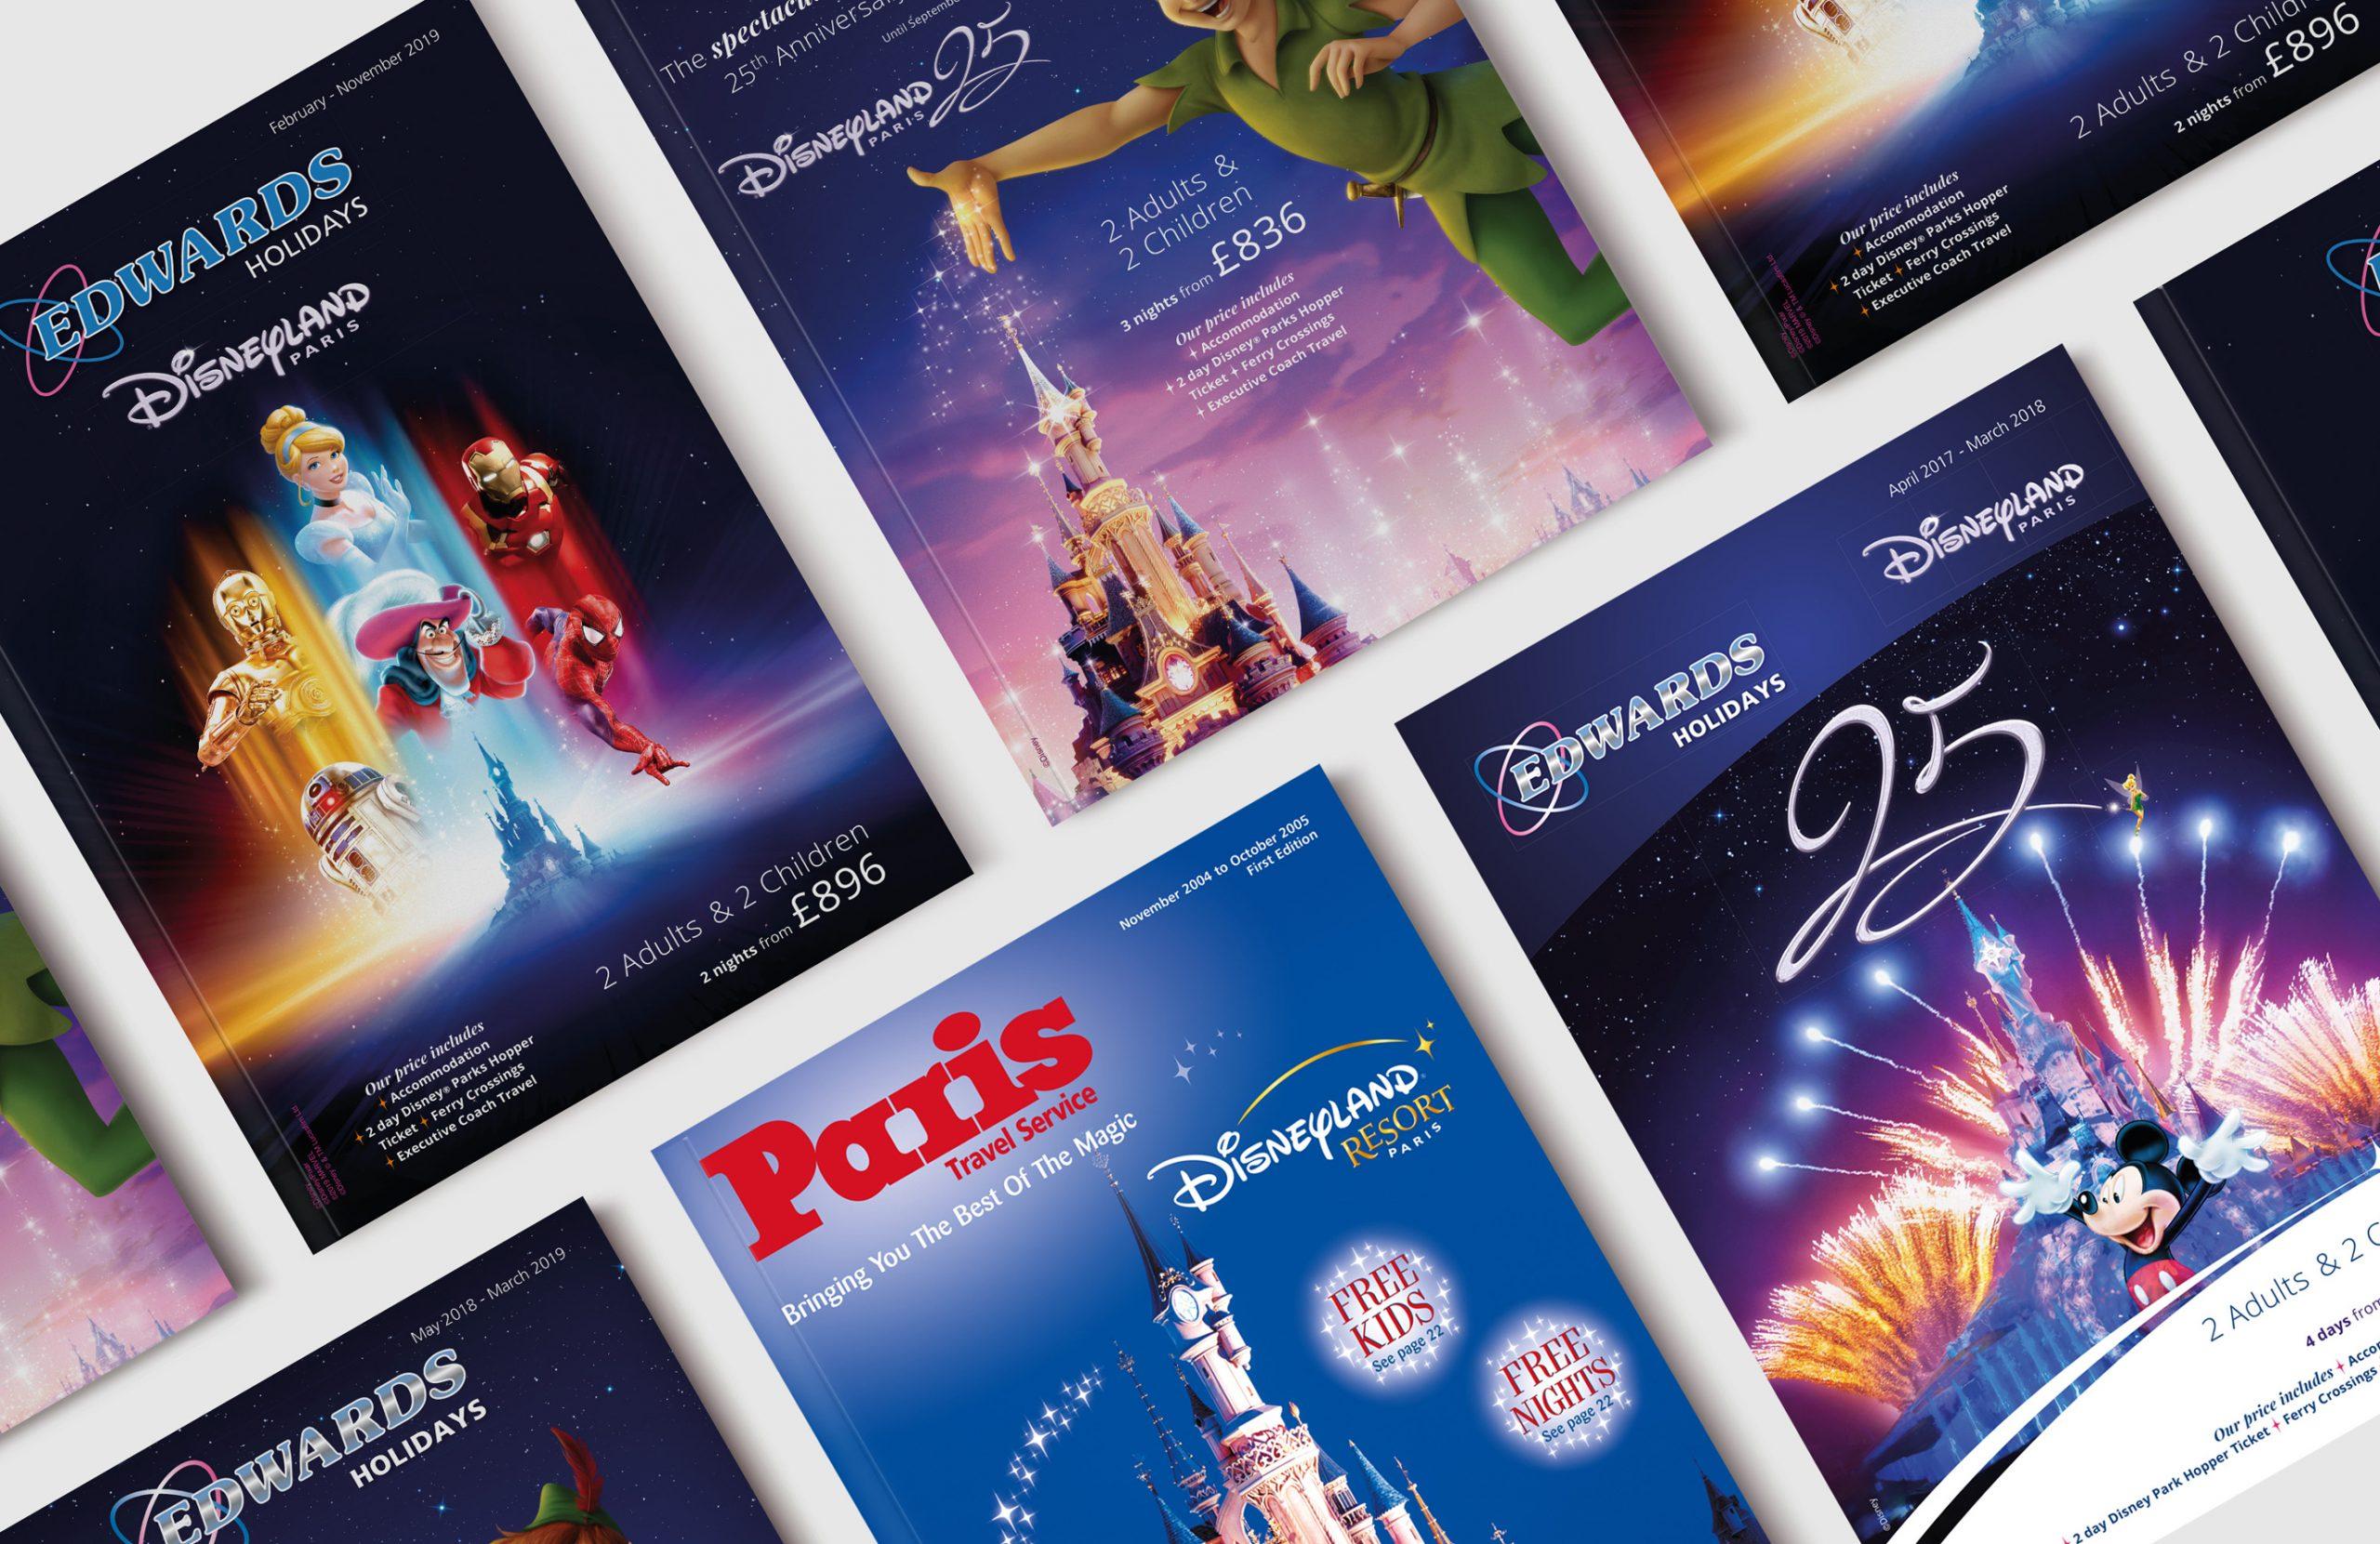 Disneyland Hotels Covers Magazine